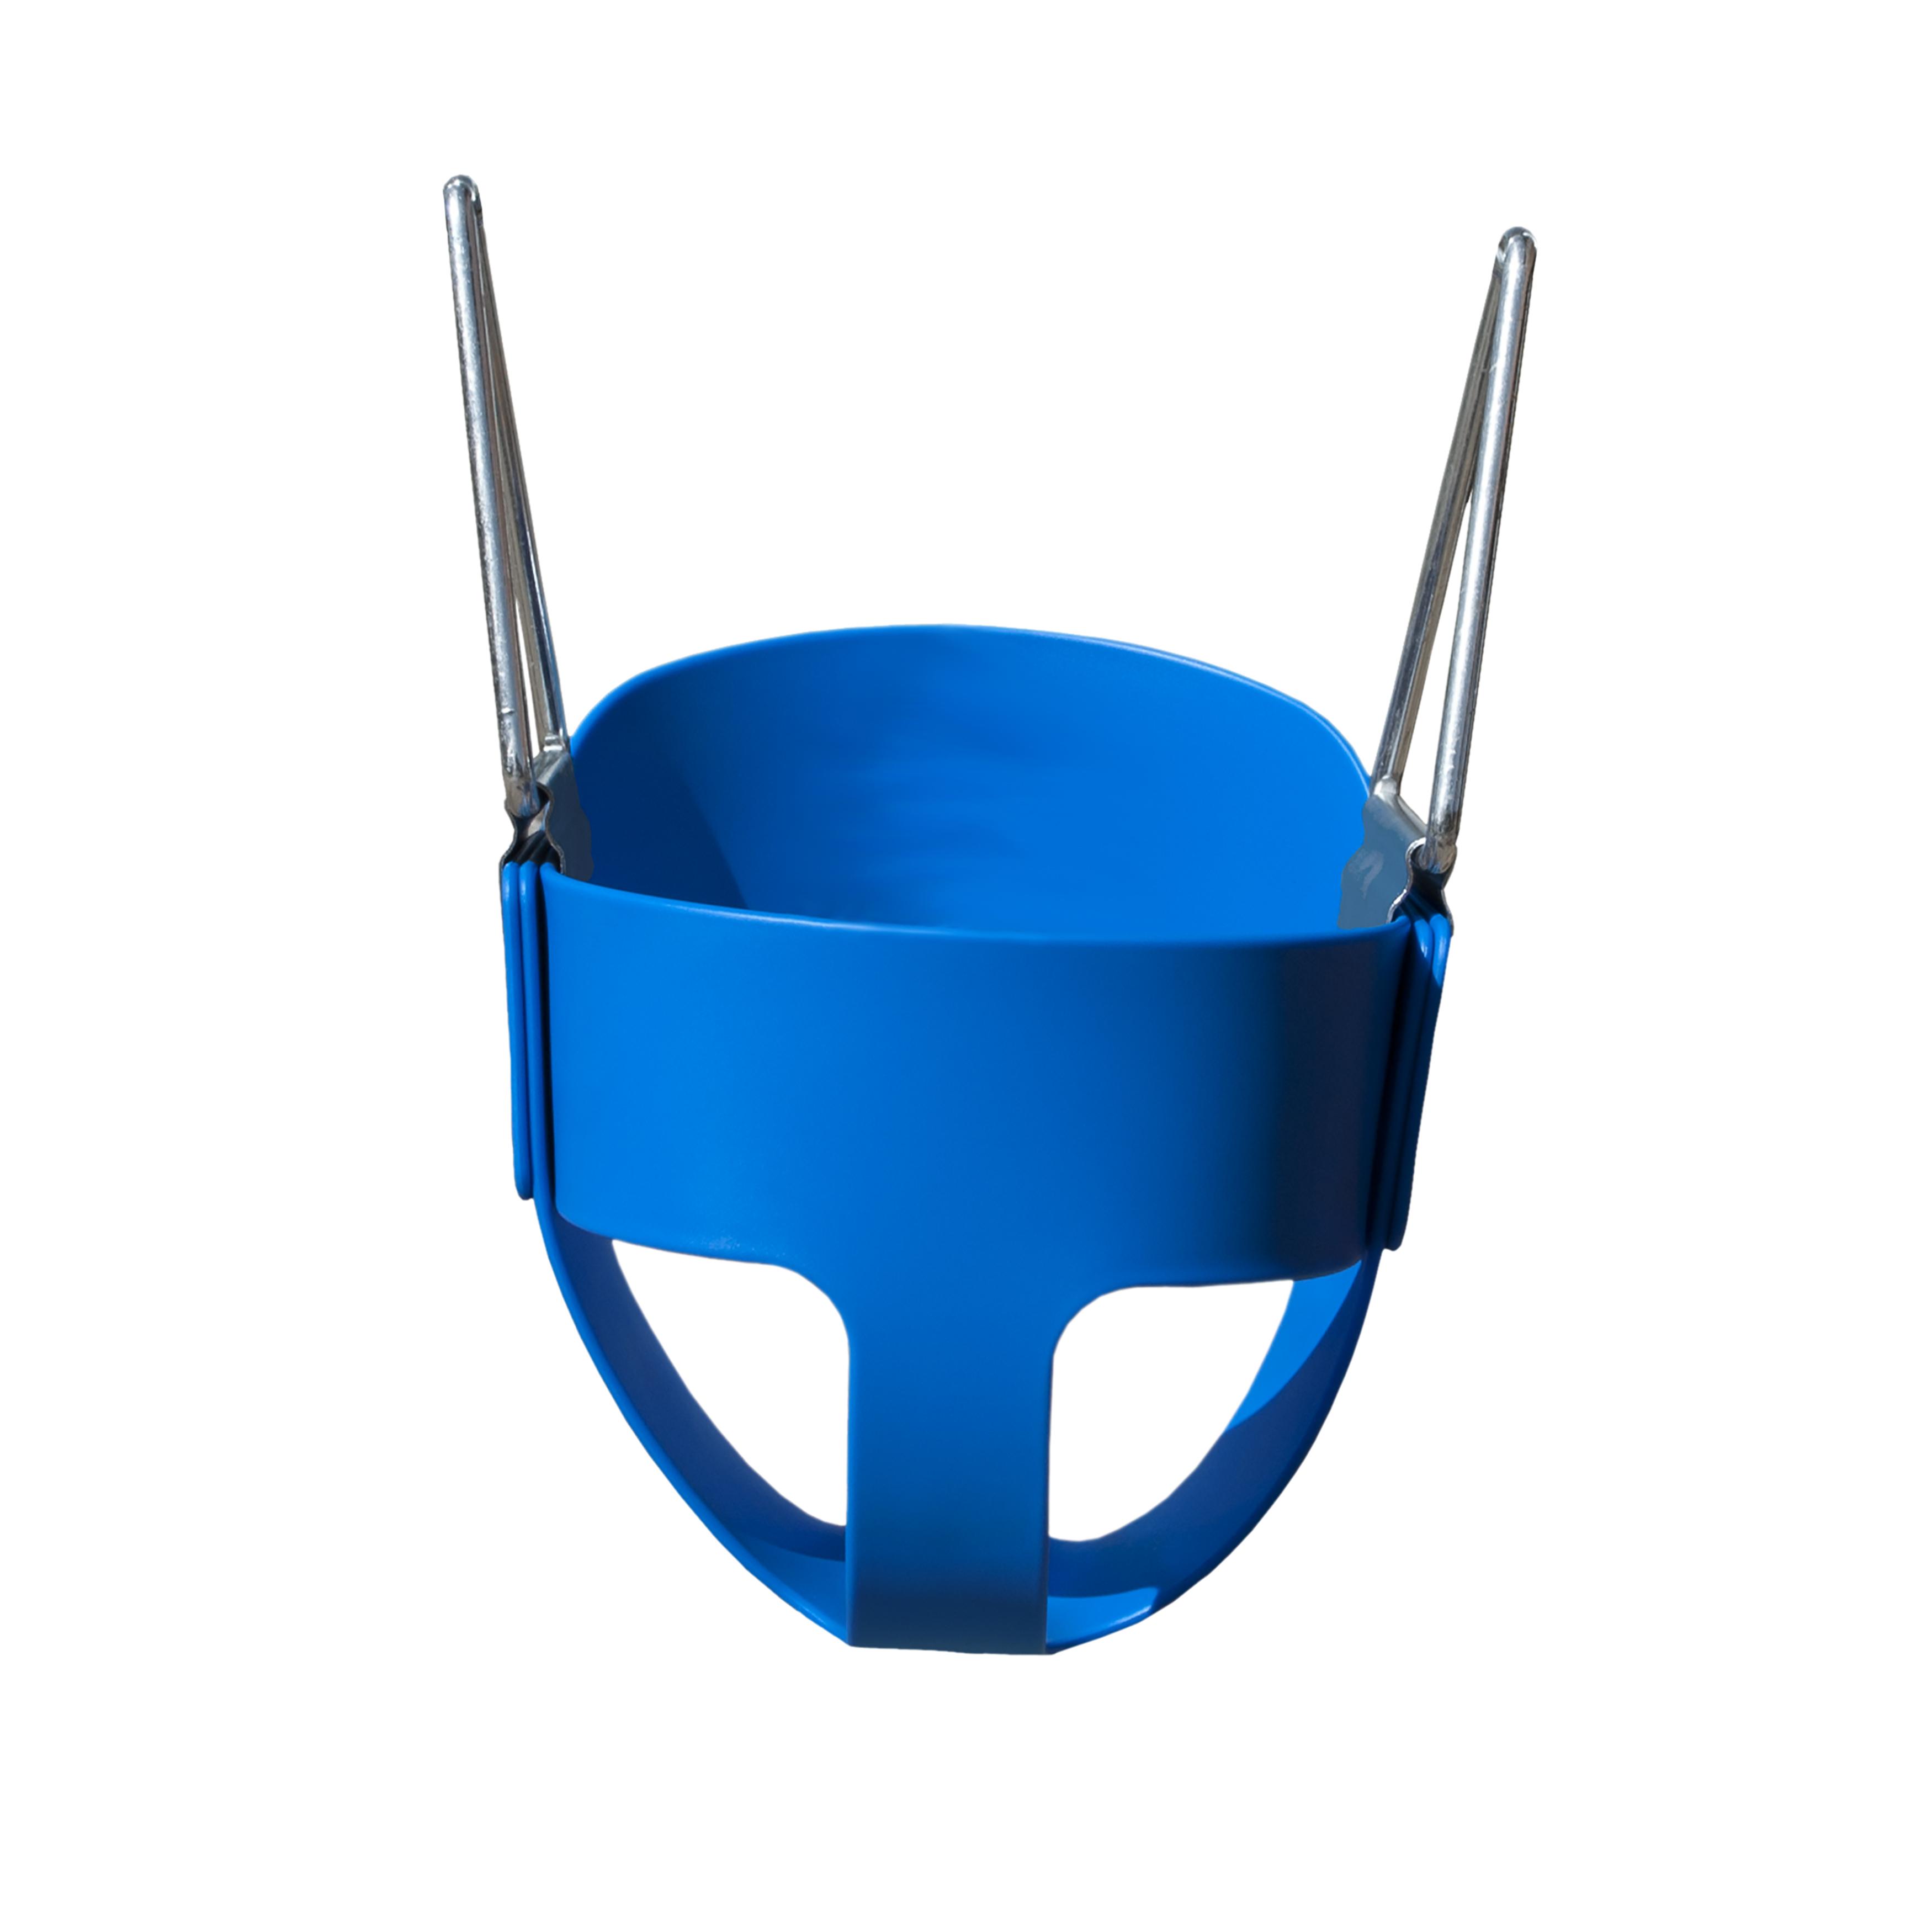 Gorilla Playsets Full BucketToddler Swing, Blue